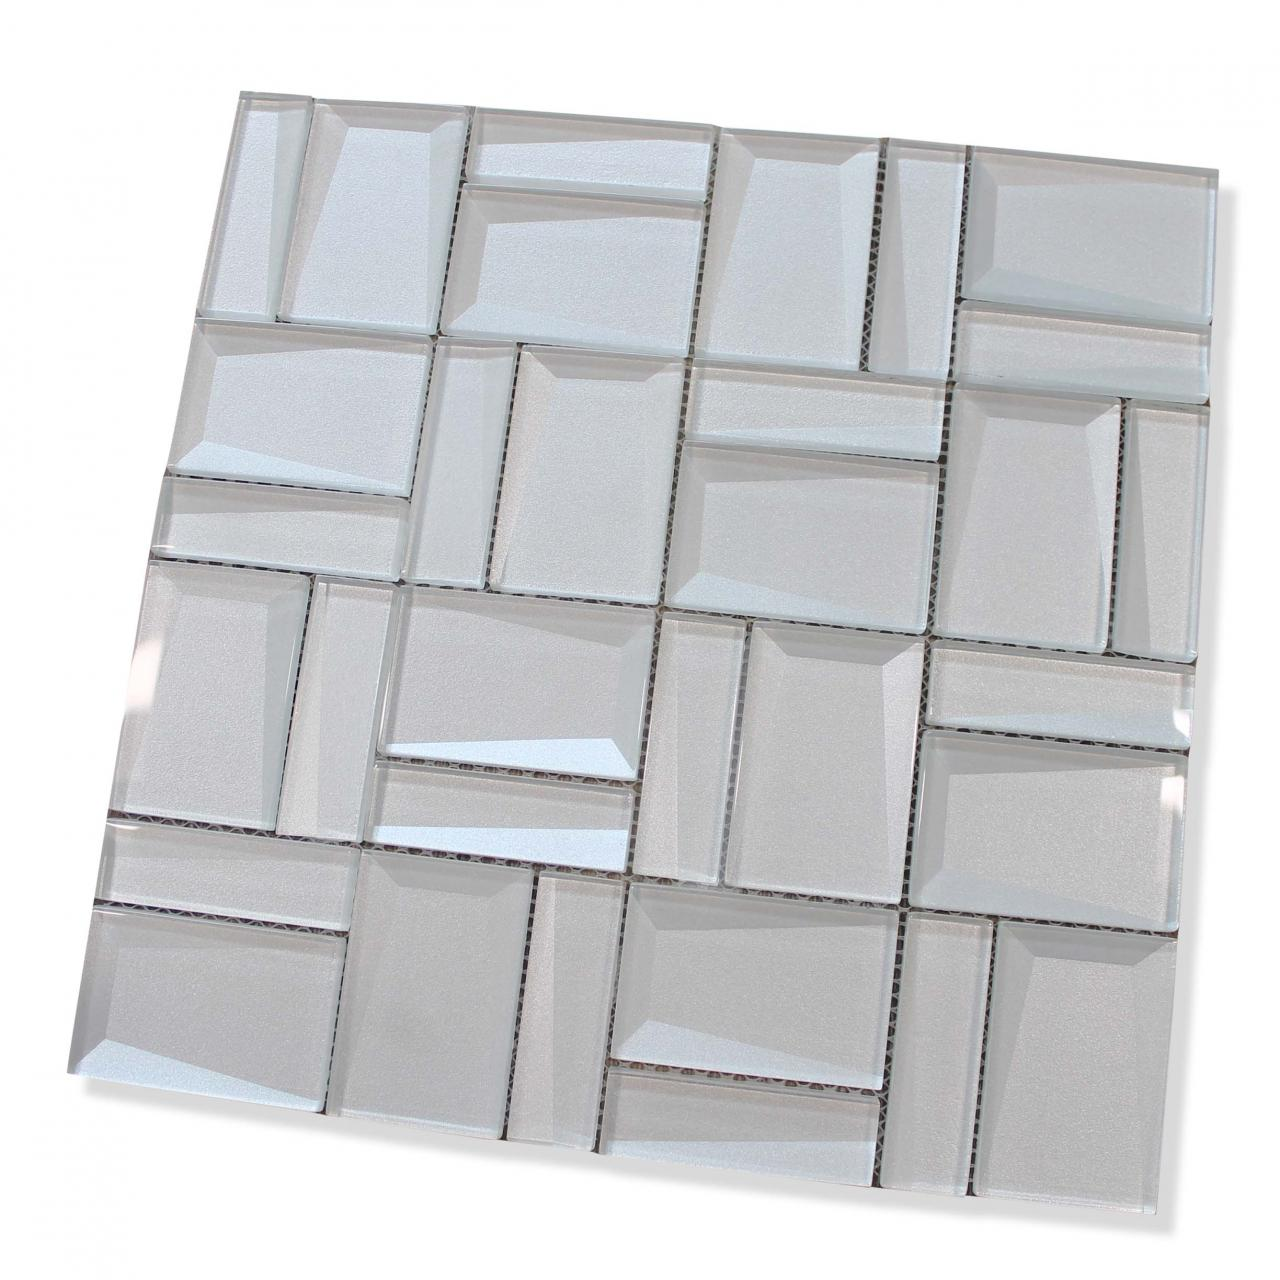 - Illusion II 3D 3x3 Beveled Glass Mosaic Tiles - Iridium